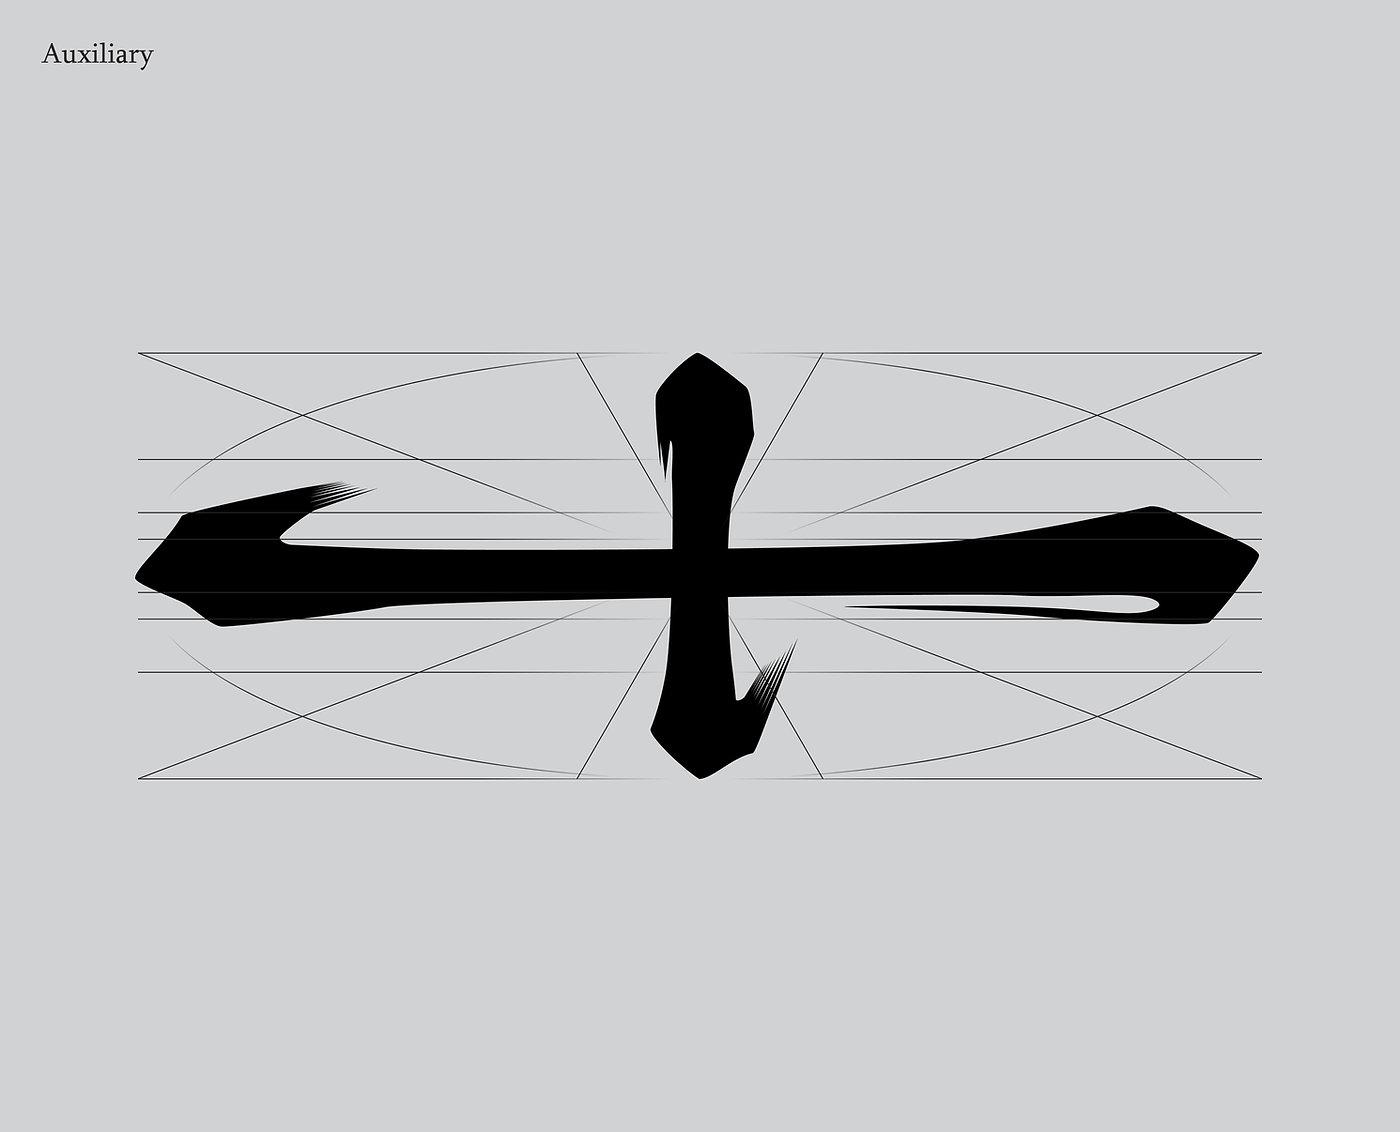 Auxiliary-06_工作區域 1 複本 2.jpg